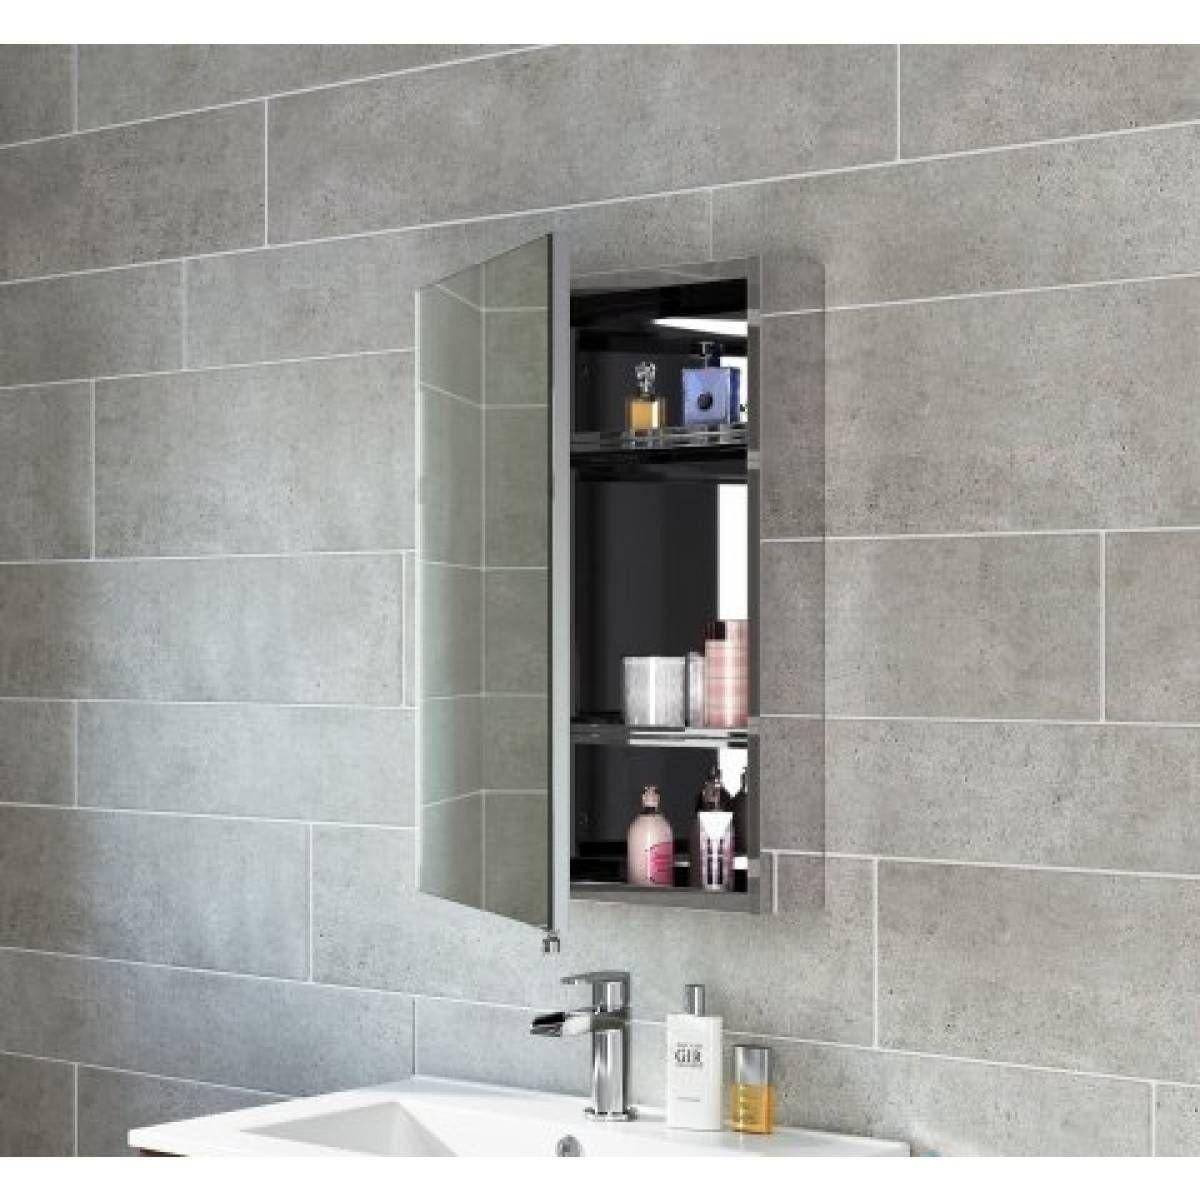 Bathroom Mirror With Storage Best Of 600x400mm Liberty Stainless Steel Single Door Mirror Cabinet Bathroom Mirror Storage Storage Mirror Bathroom Mirror